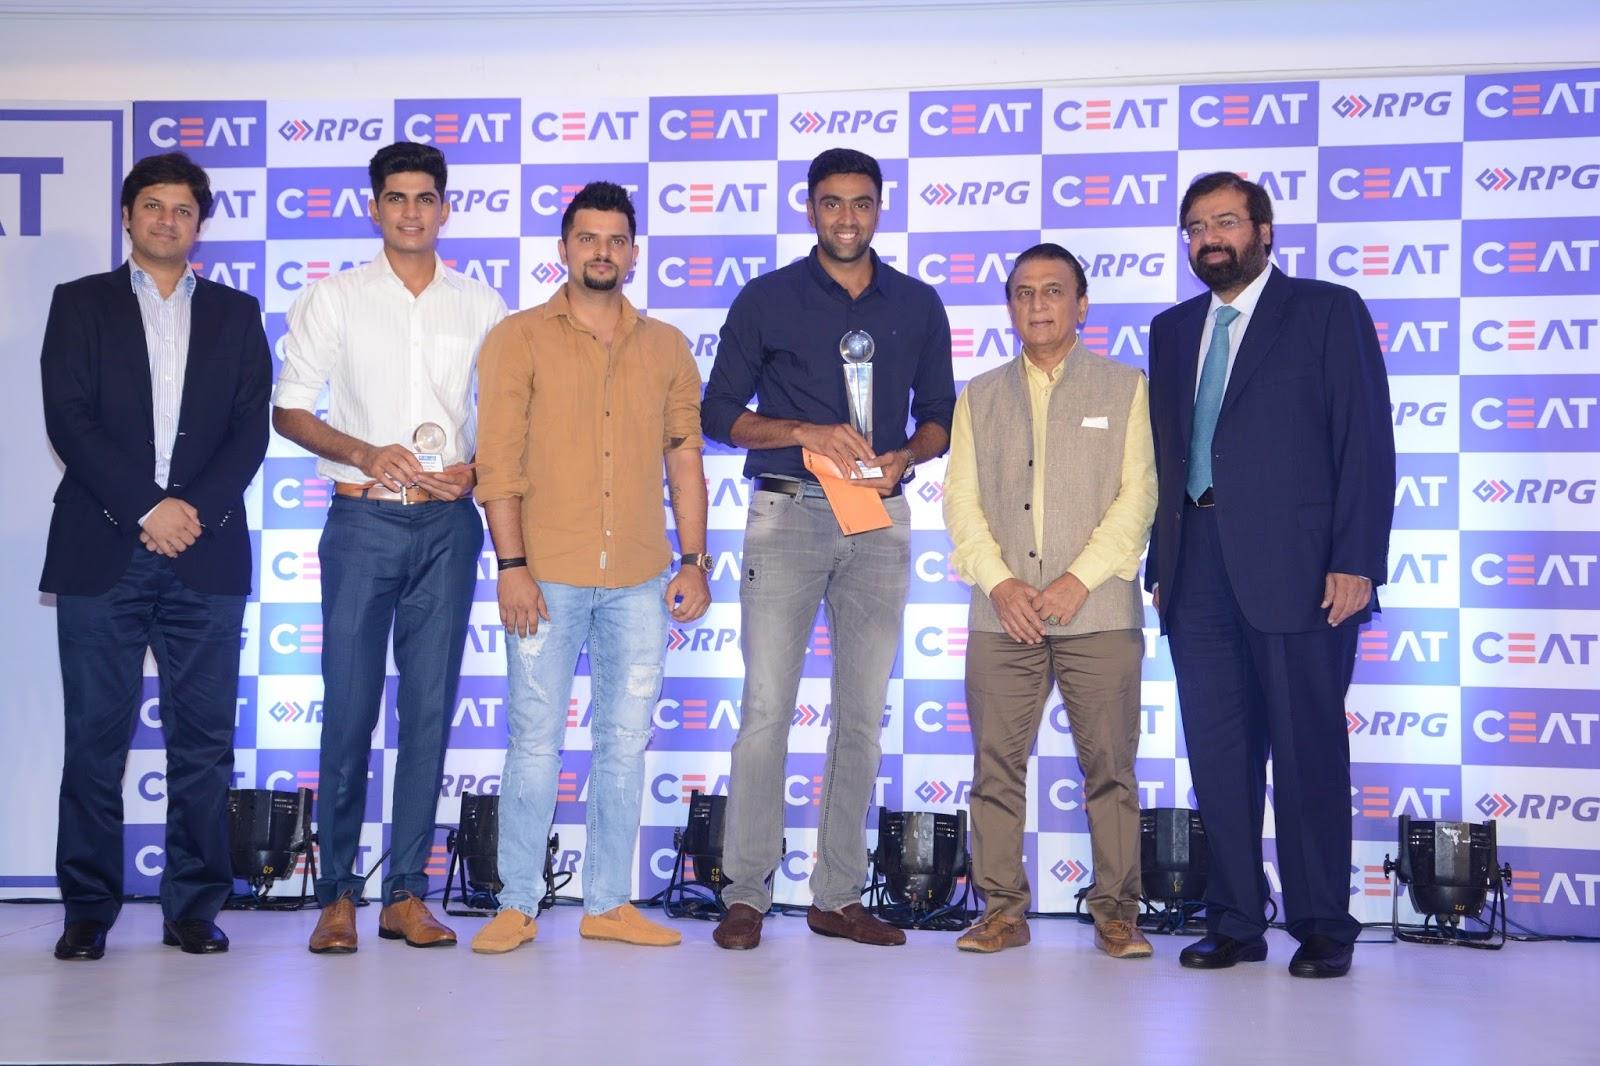 Ceat Cricket Rating Felicitates R Ashwin As International